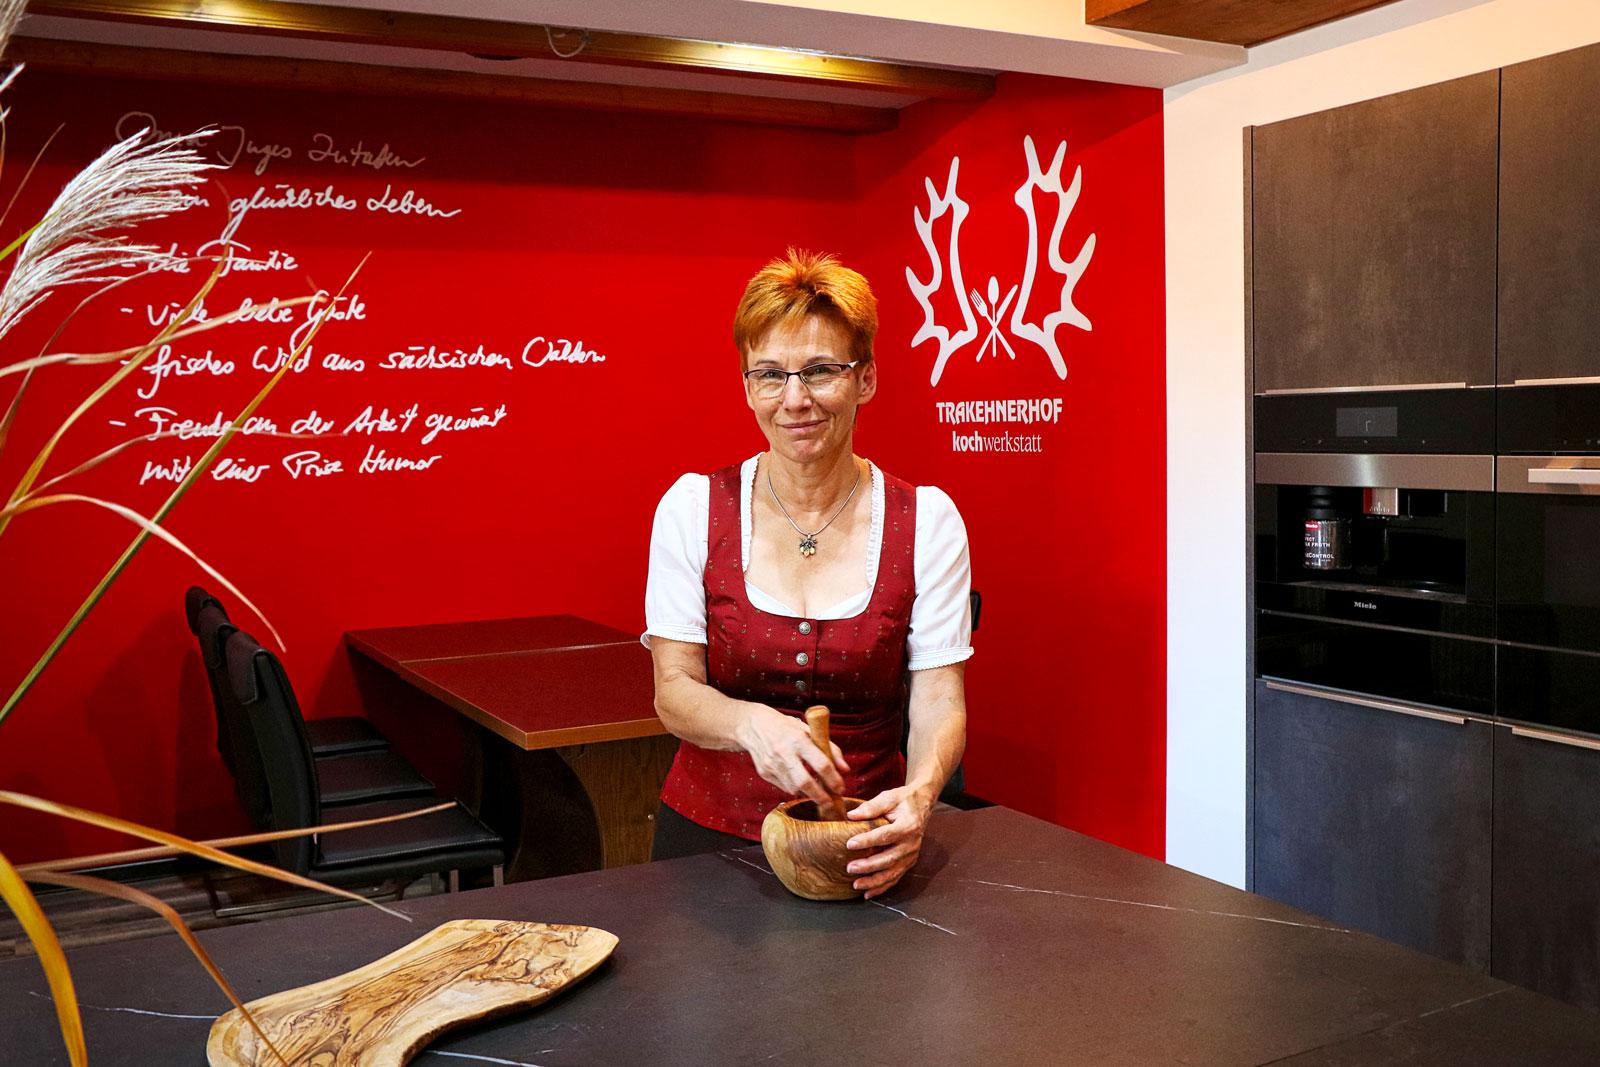 Trakehnerhof Kochwerkstatt